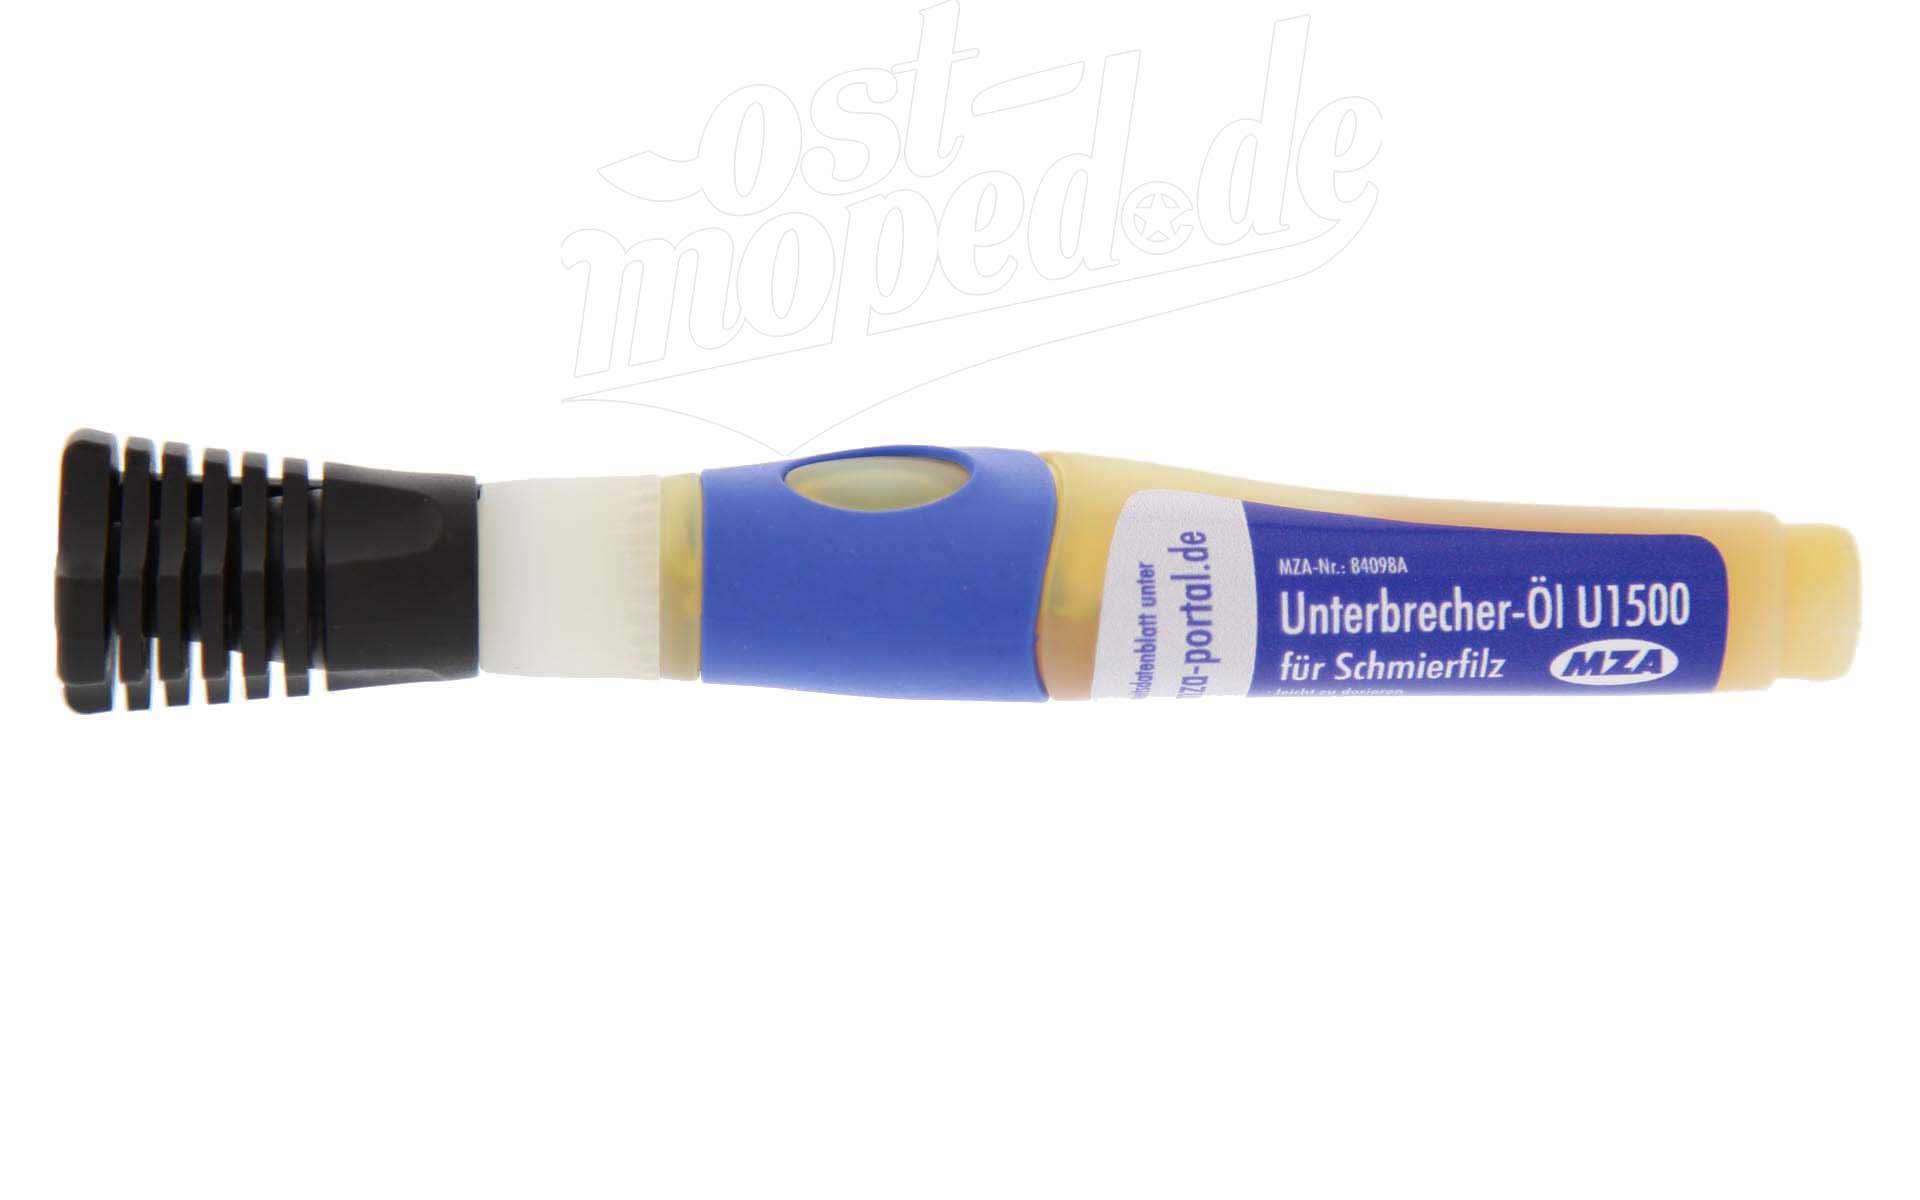 Addinol Öl Stift Unterbrecheröl